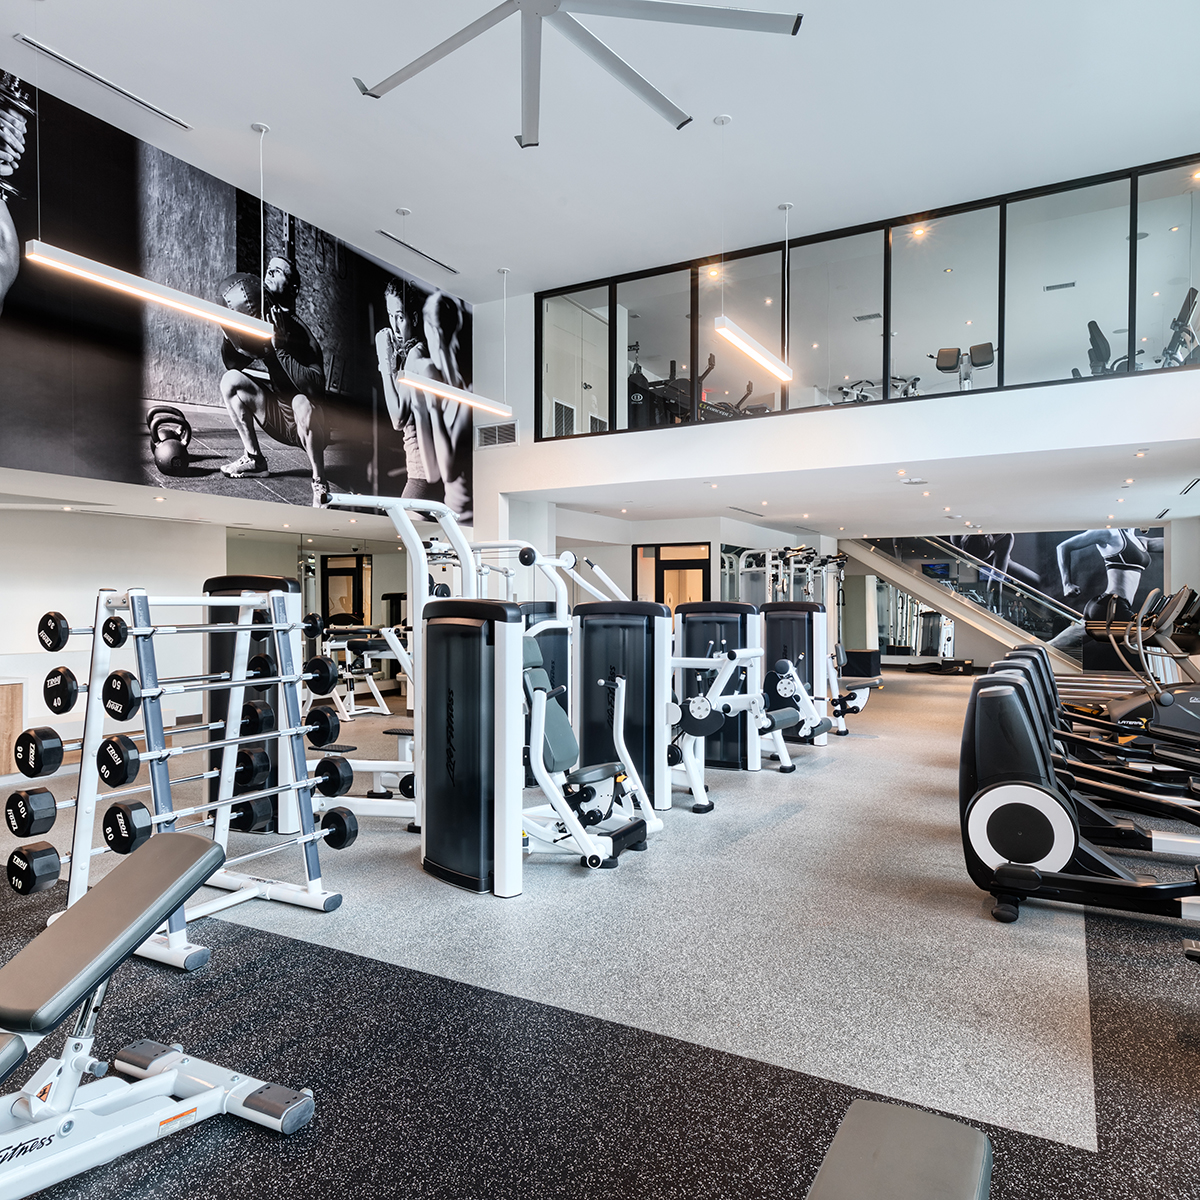 Altana Amenities - Fitness Center